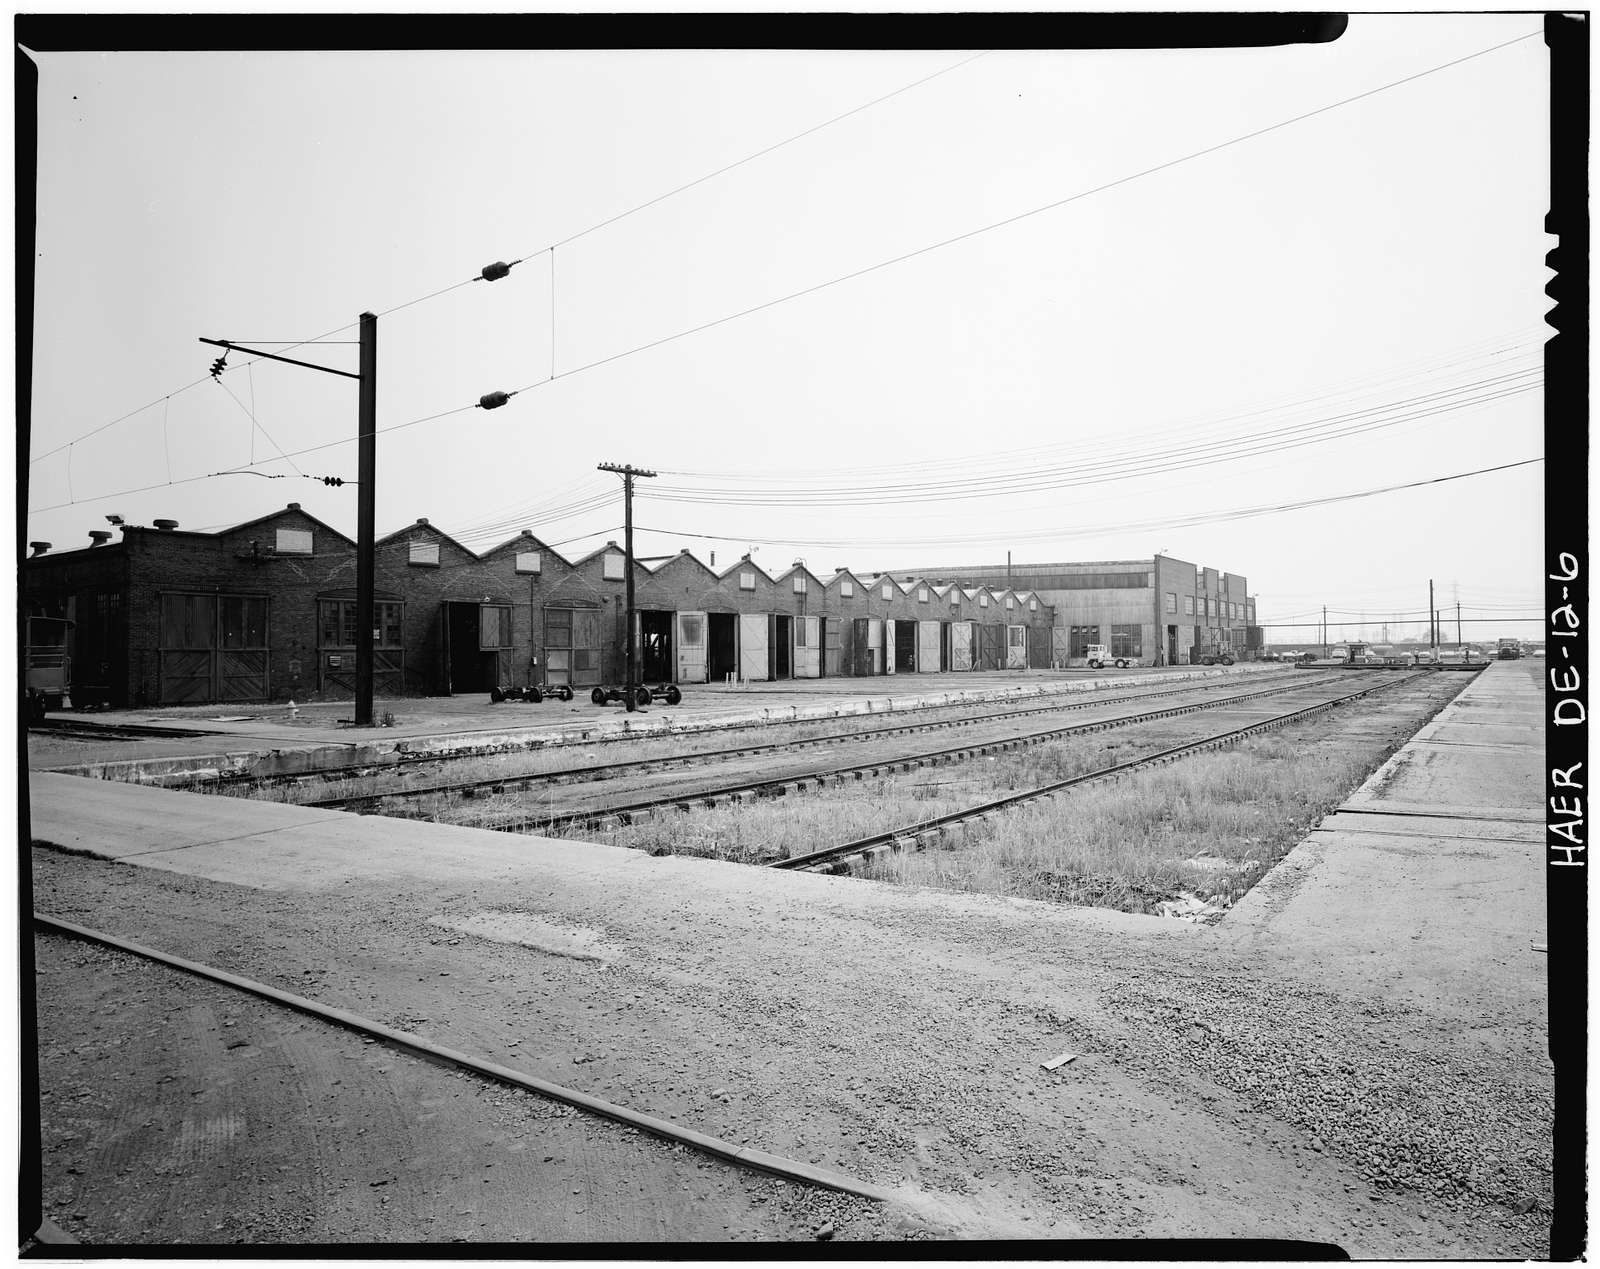 Pennsylvania Railroad Improvements, Repair Shop, Vandever & Bowers Streets, Wilmington, New Castle County, DE